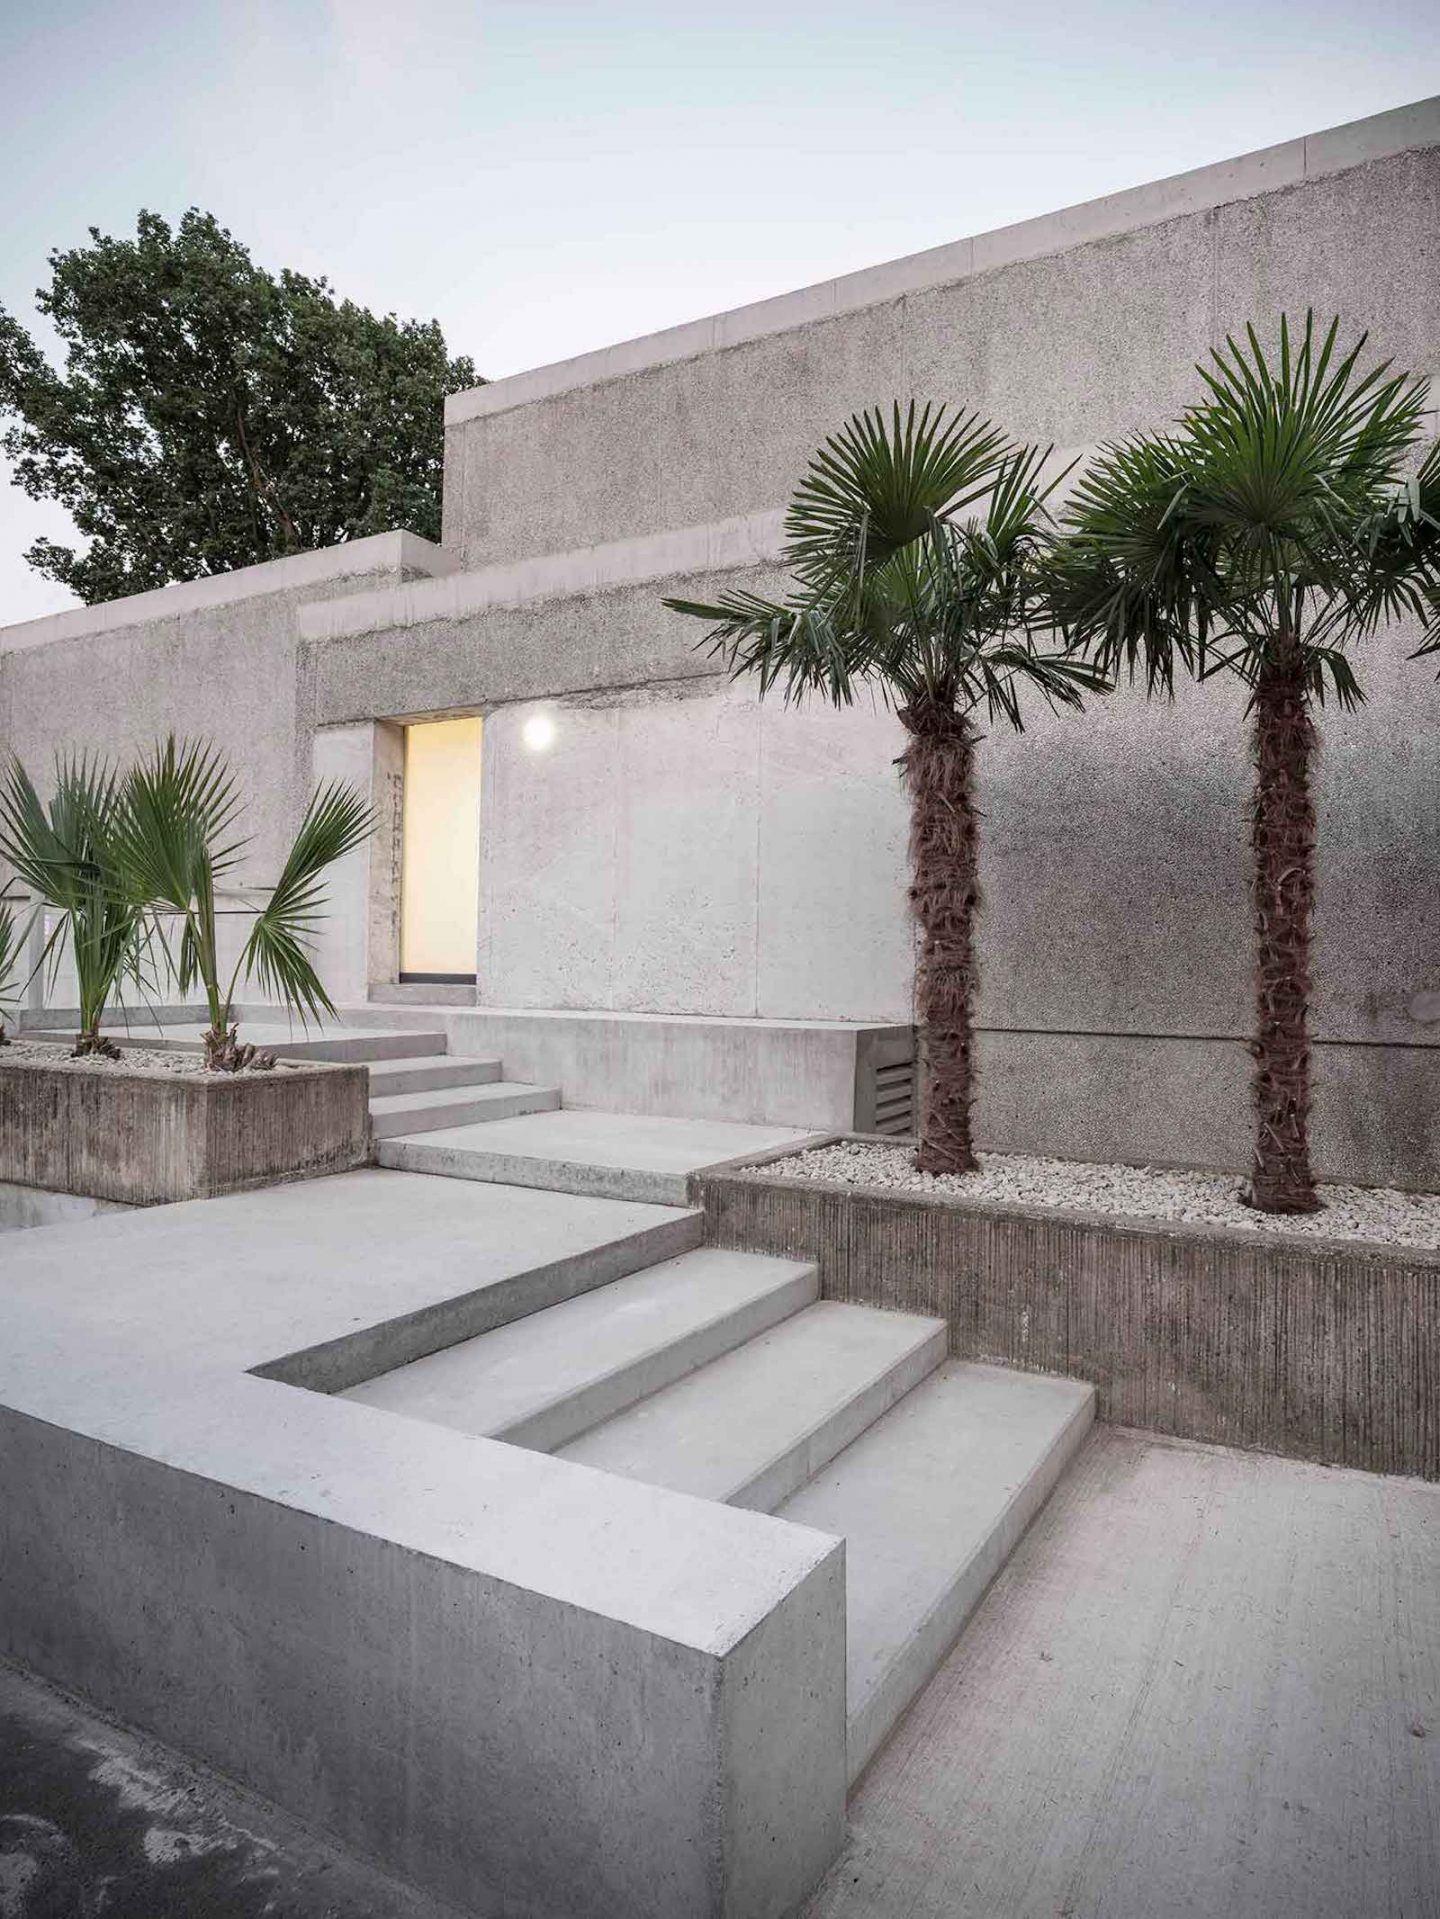 IGNANT-Architecture-JMayerH-Casa-Morgana-02